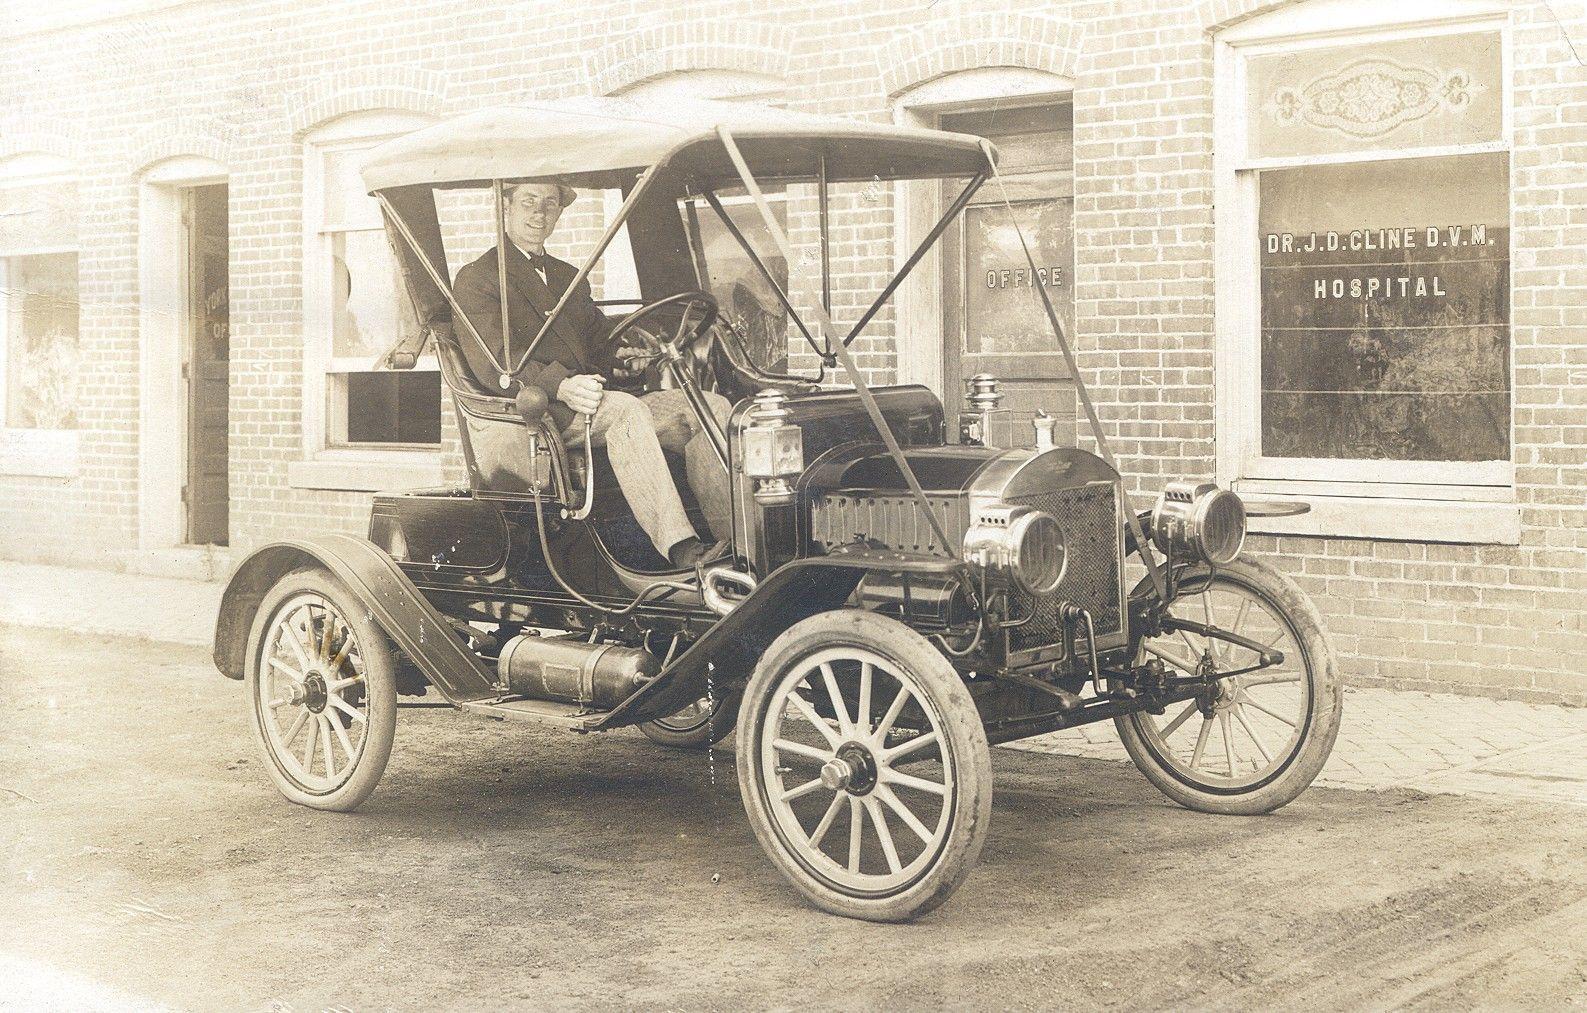 Old car picture.Vintage Pictures, Photographs, | Vintage Pictures ...